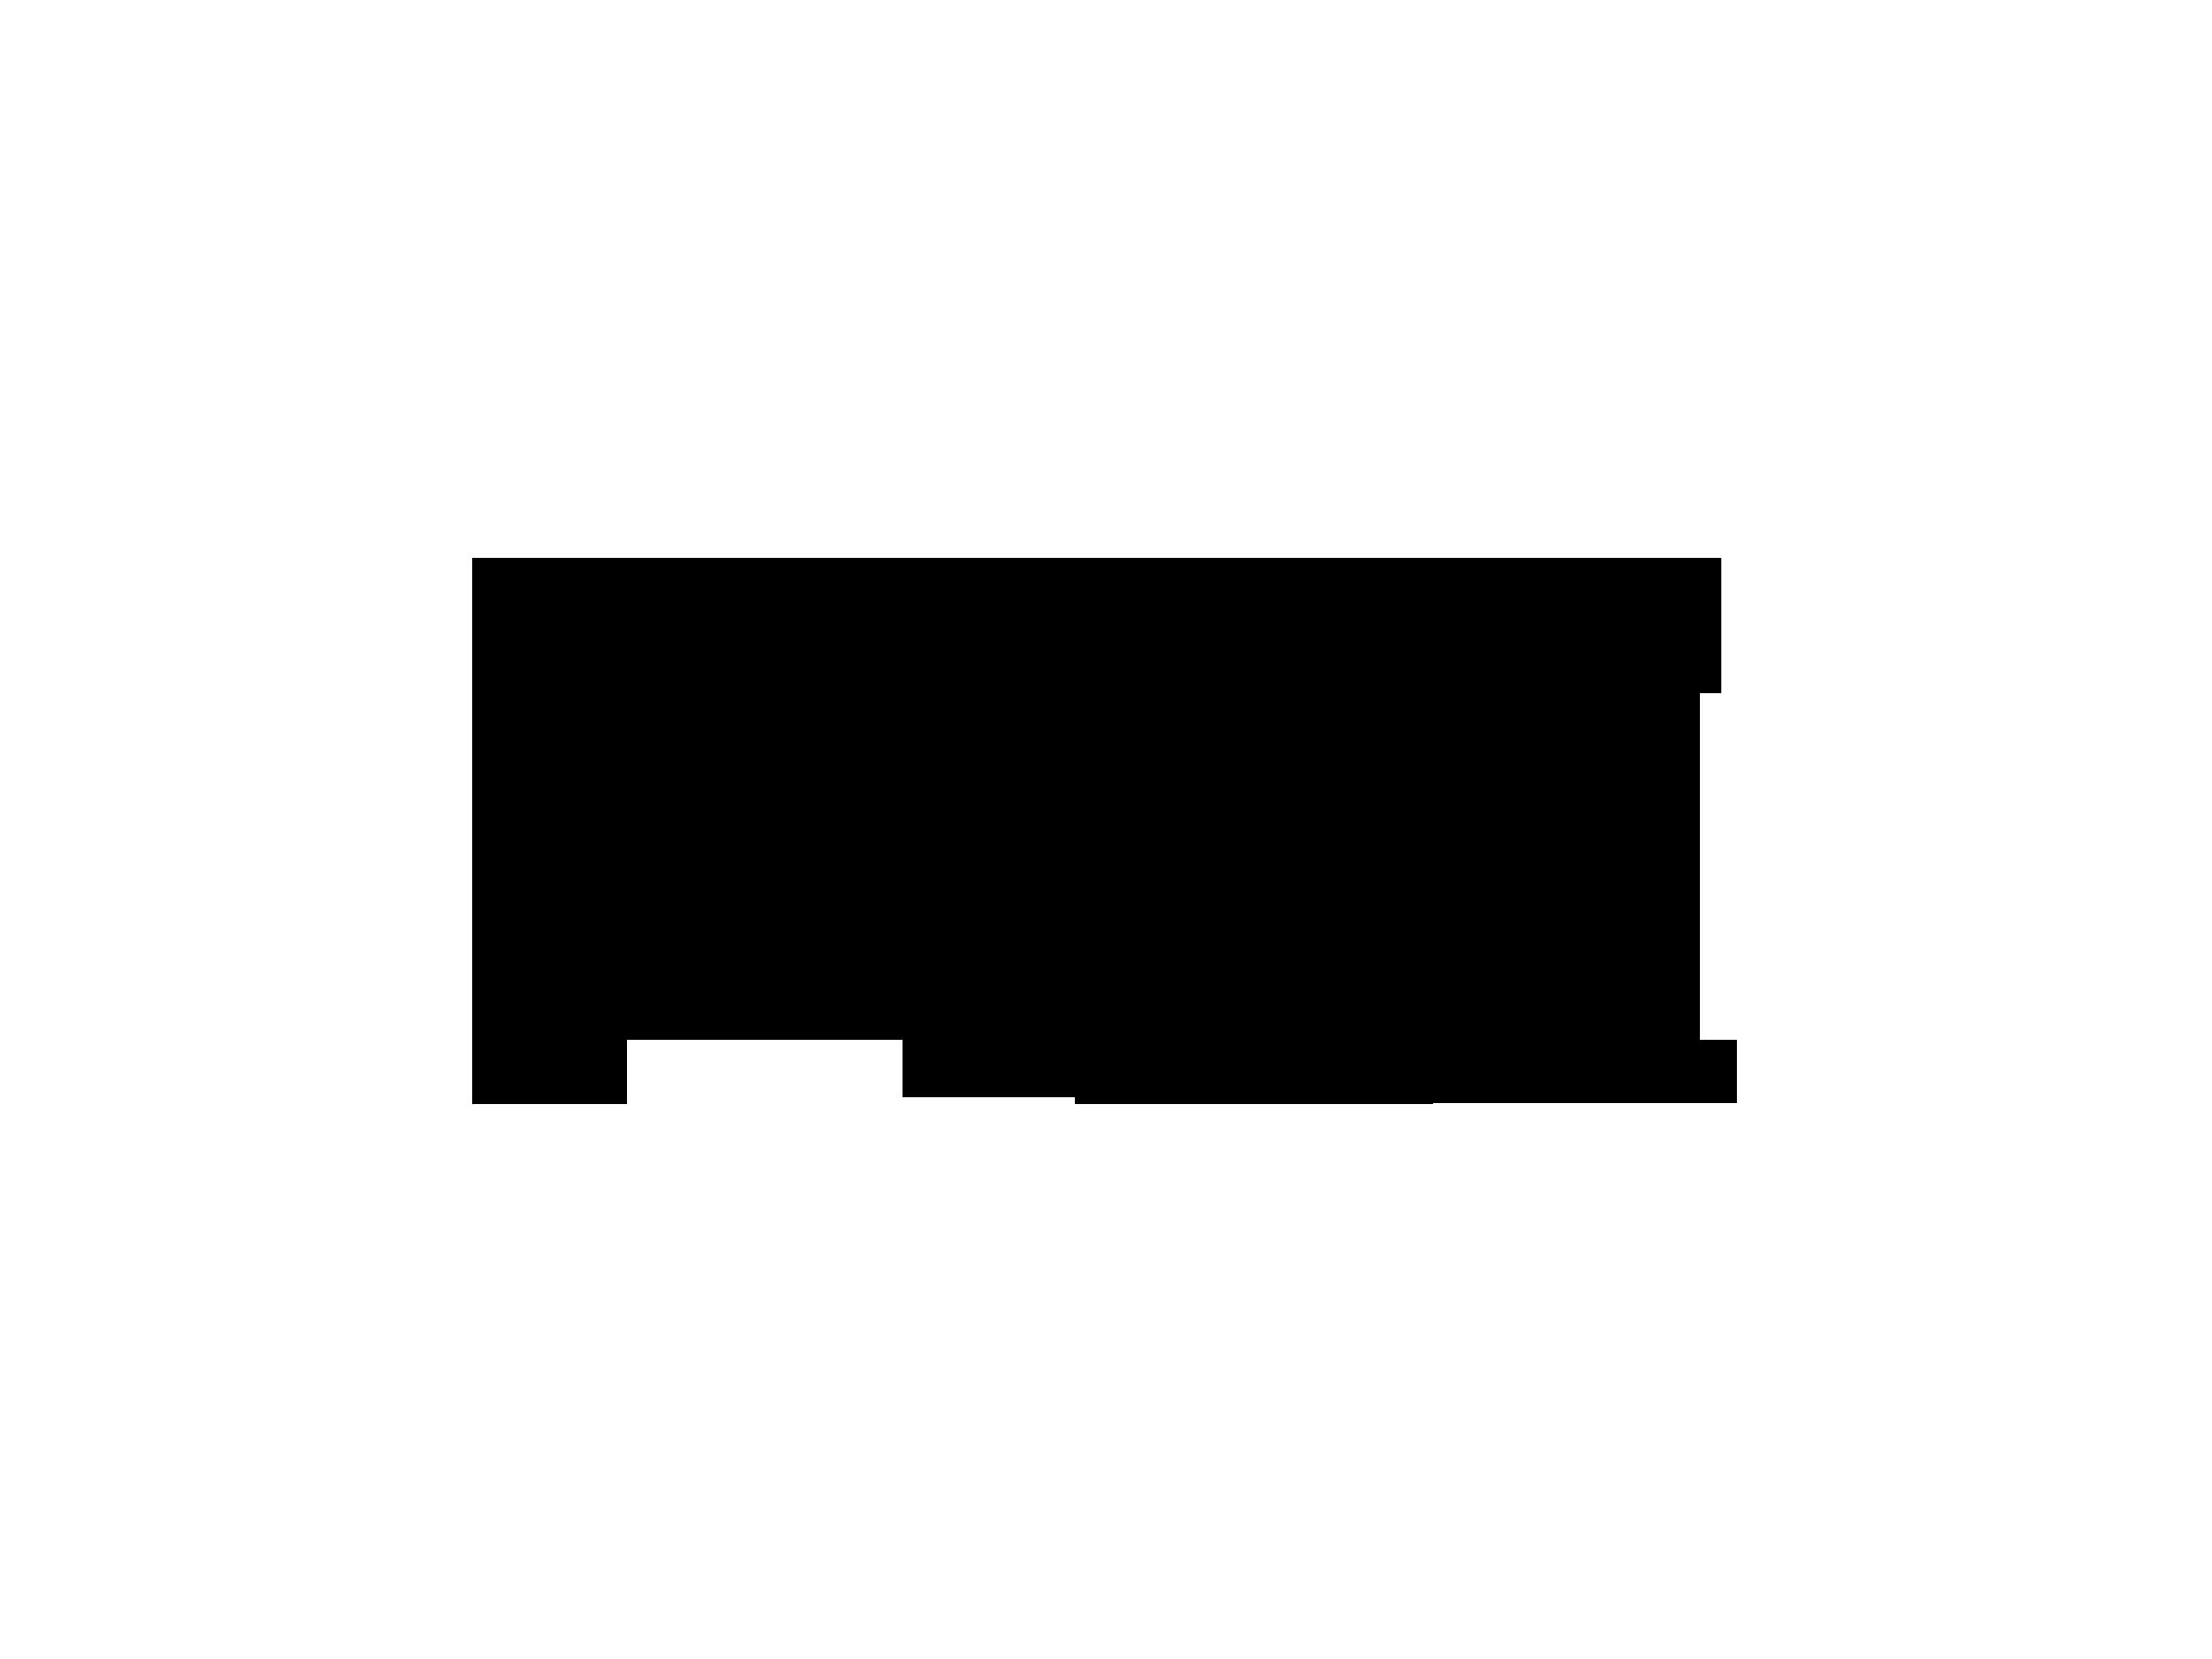 FOX logo png #1625